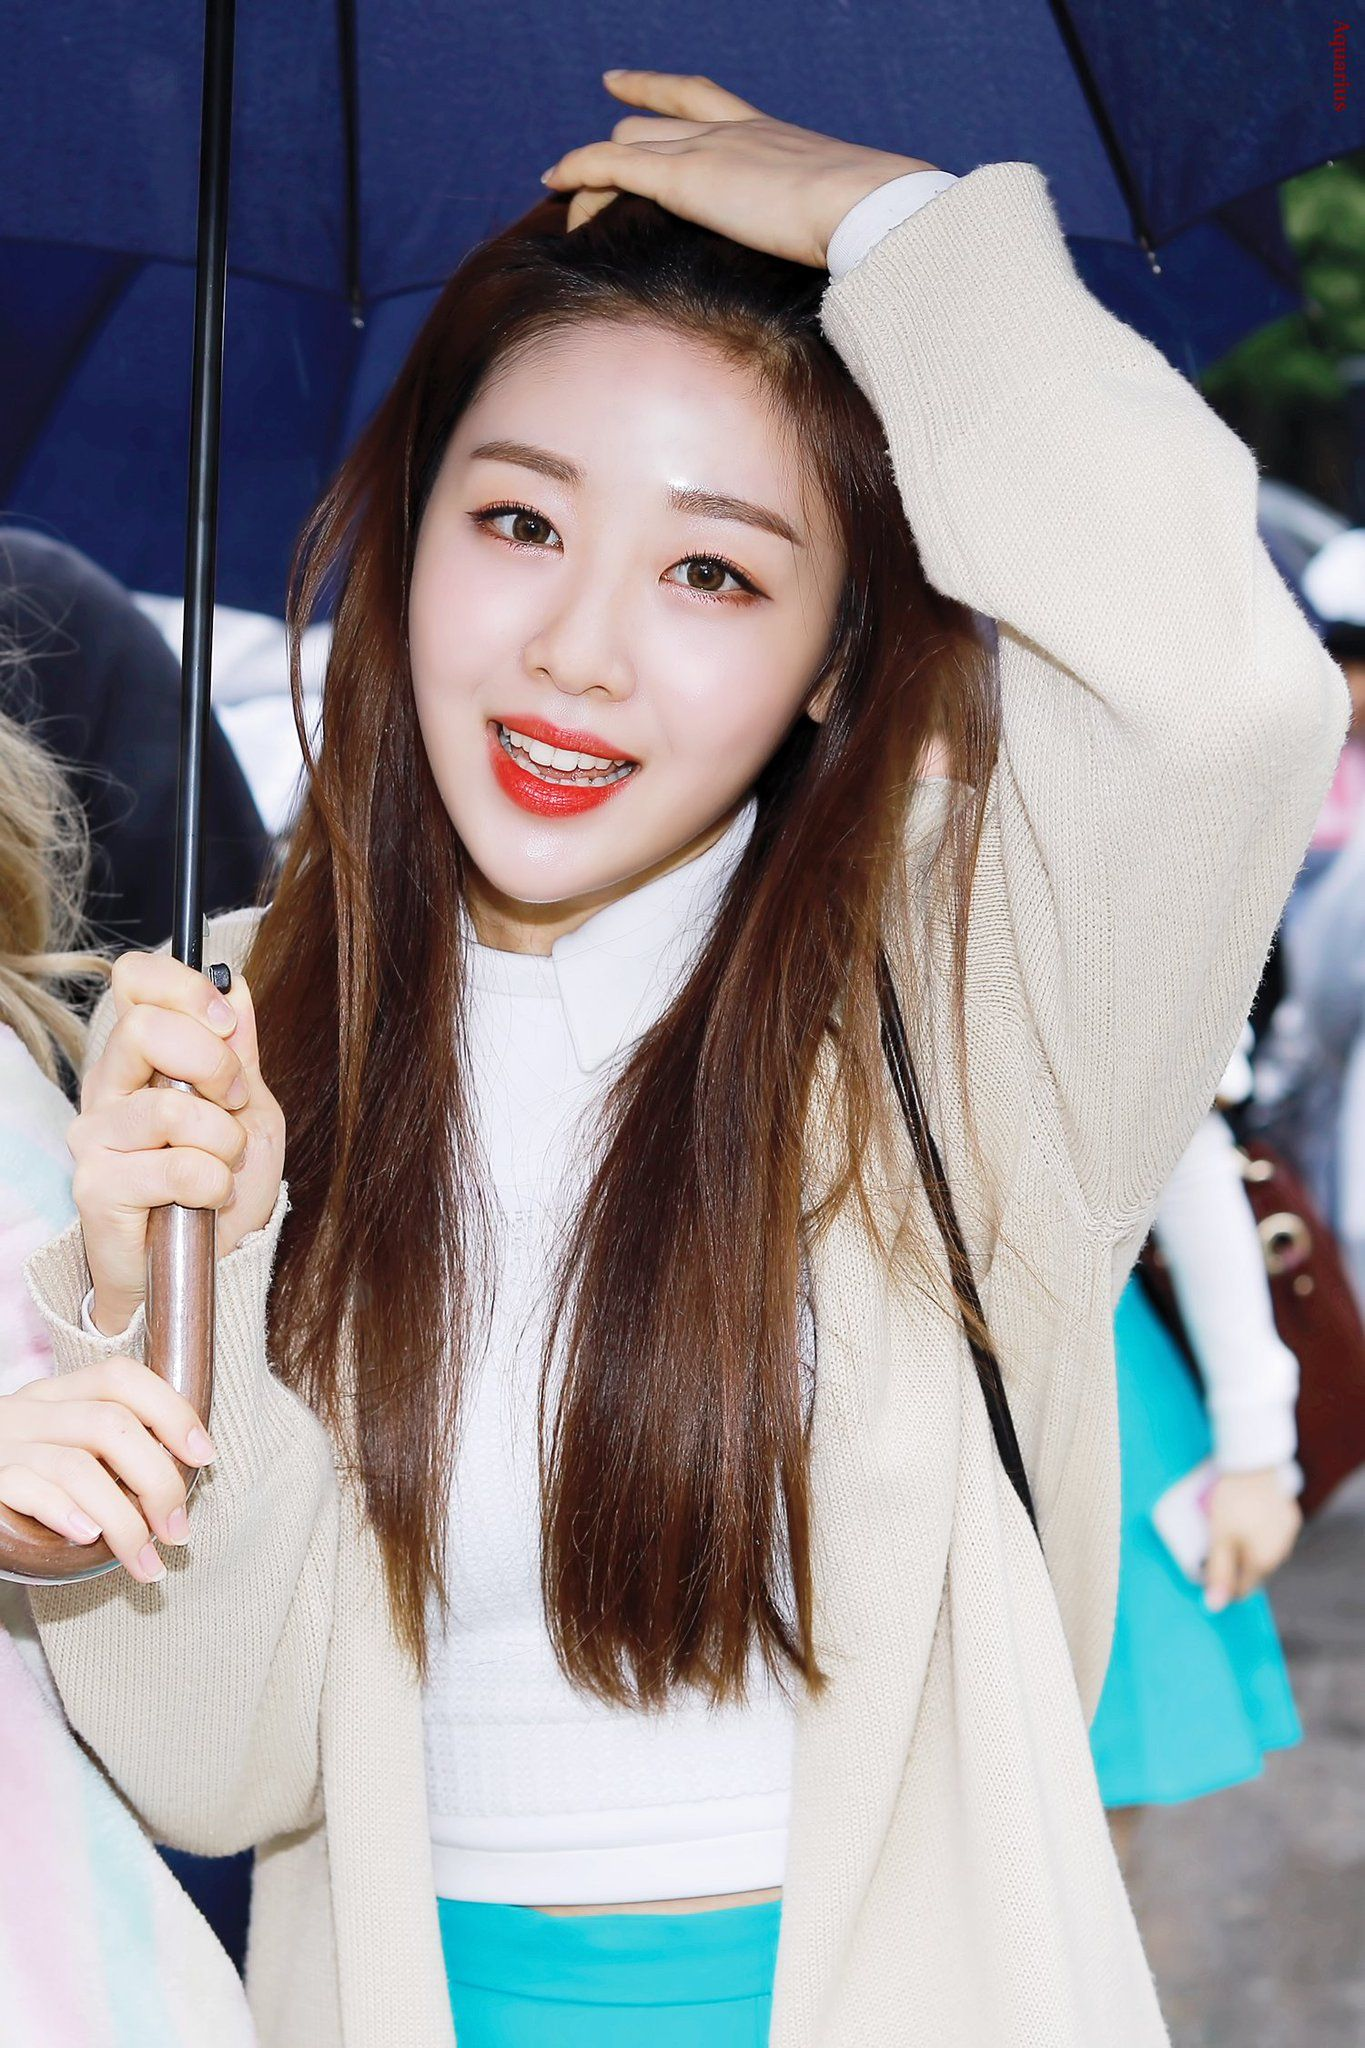 Loopd Pics Hiatus On Twitter In 2020 Kpop Girls Girl Sooyoung